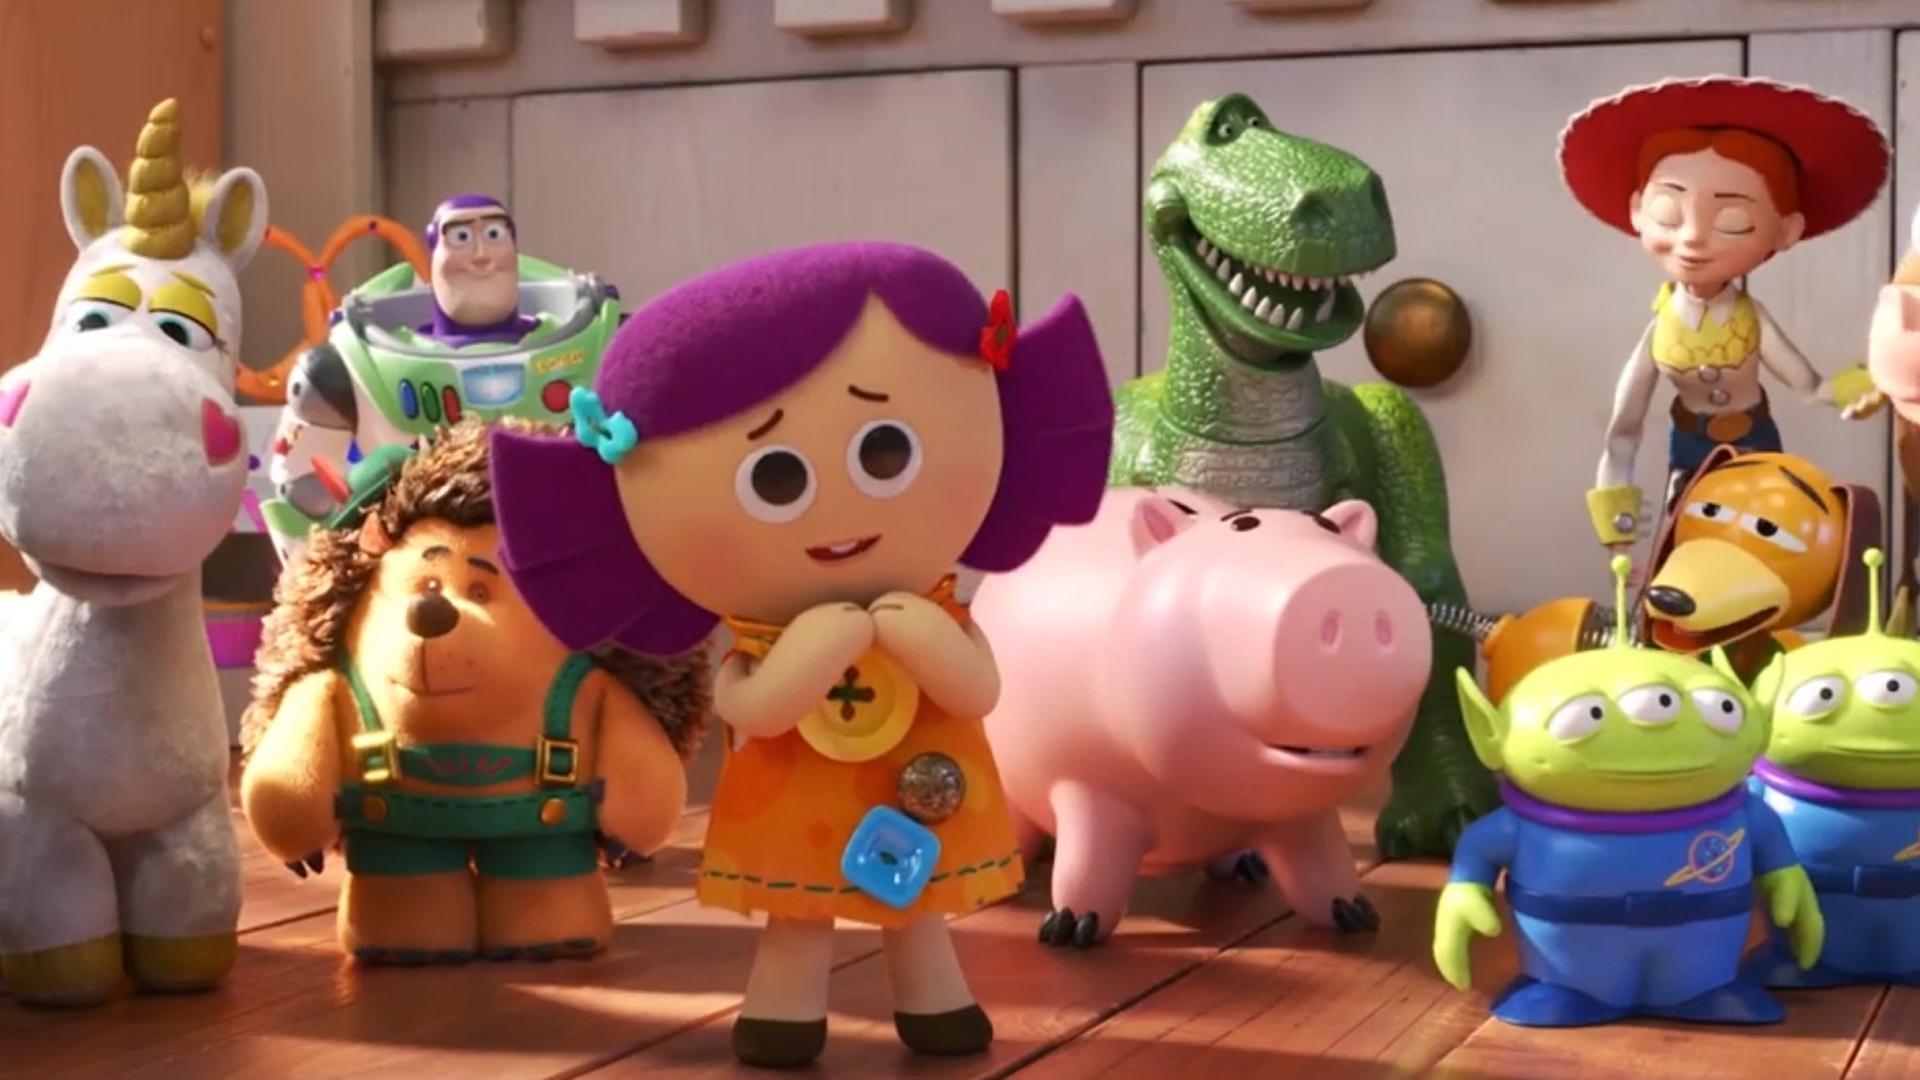 Disney Lanzo El Primer Trailer Extendido De Toy Story 4 Infobae